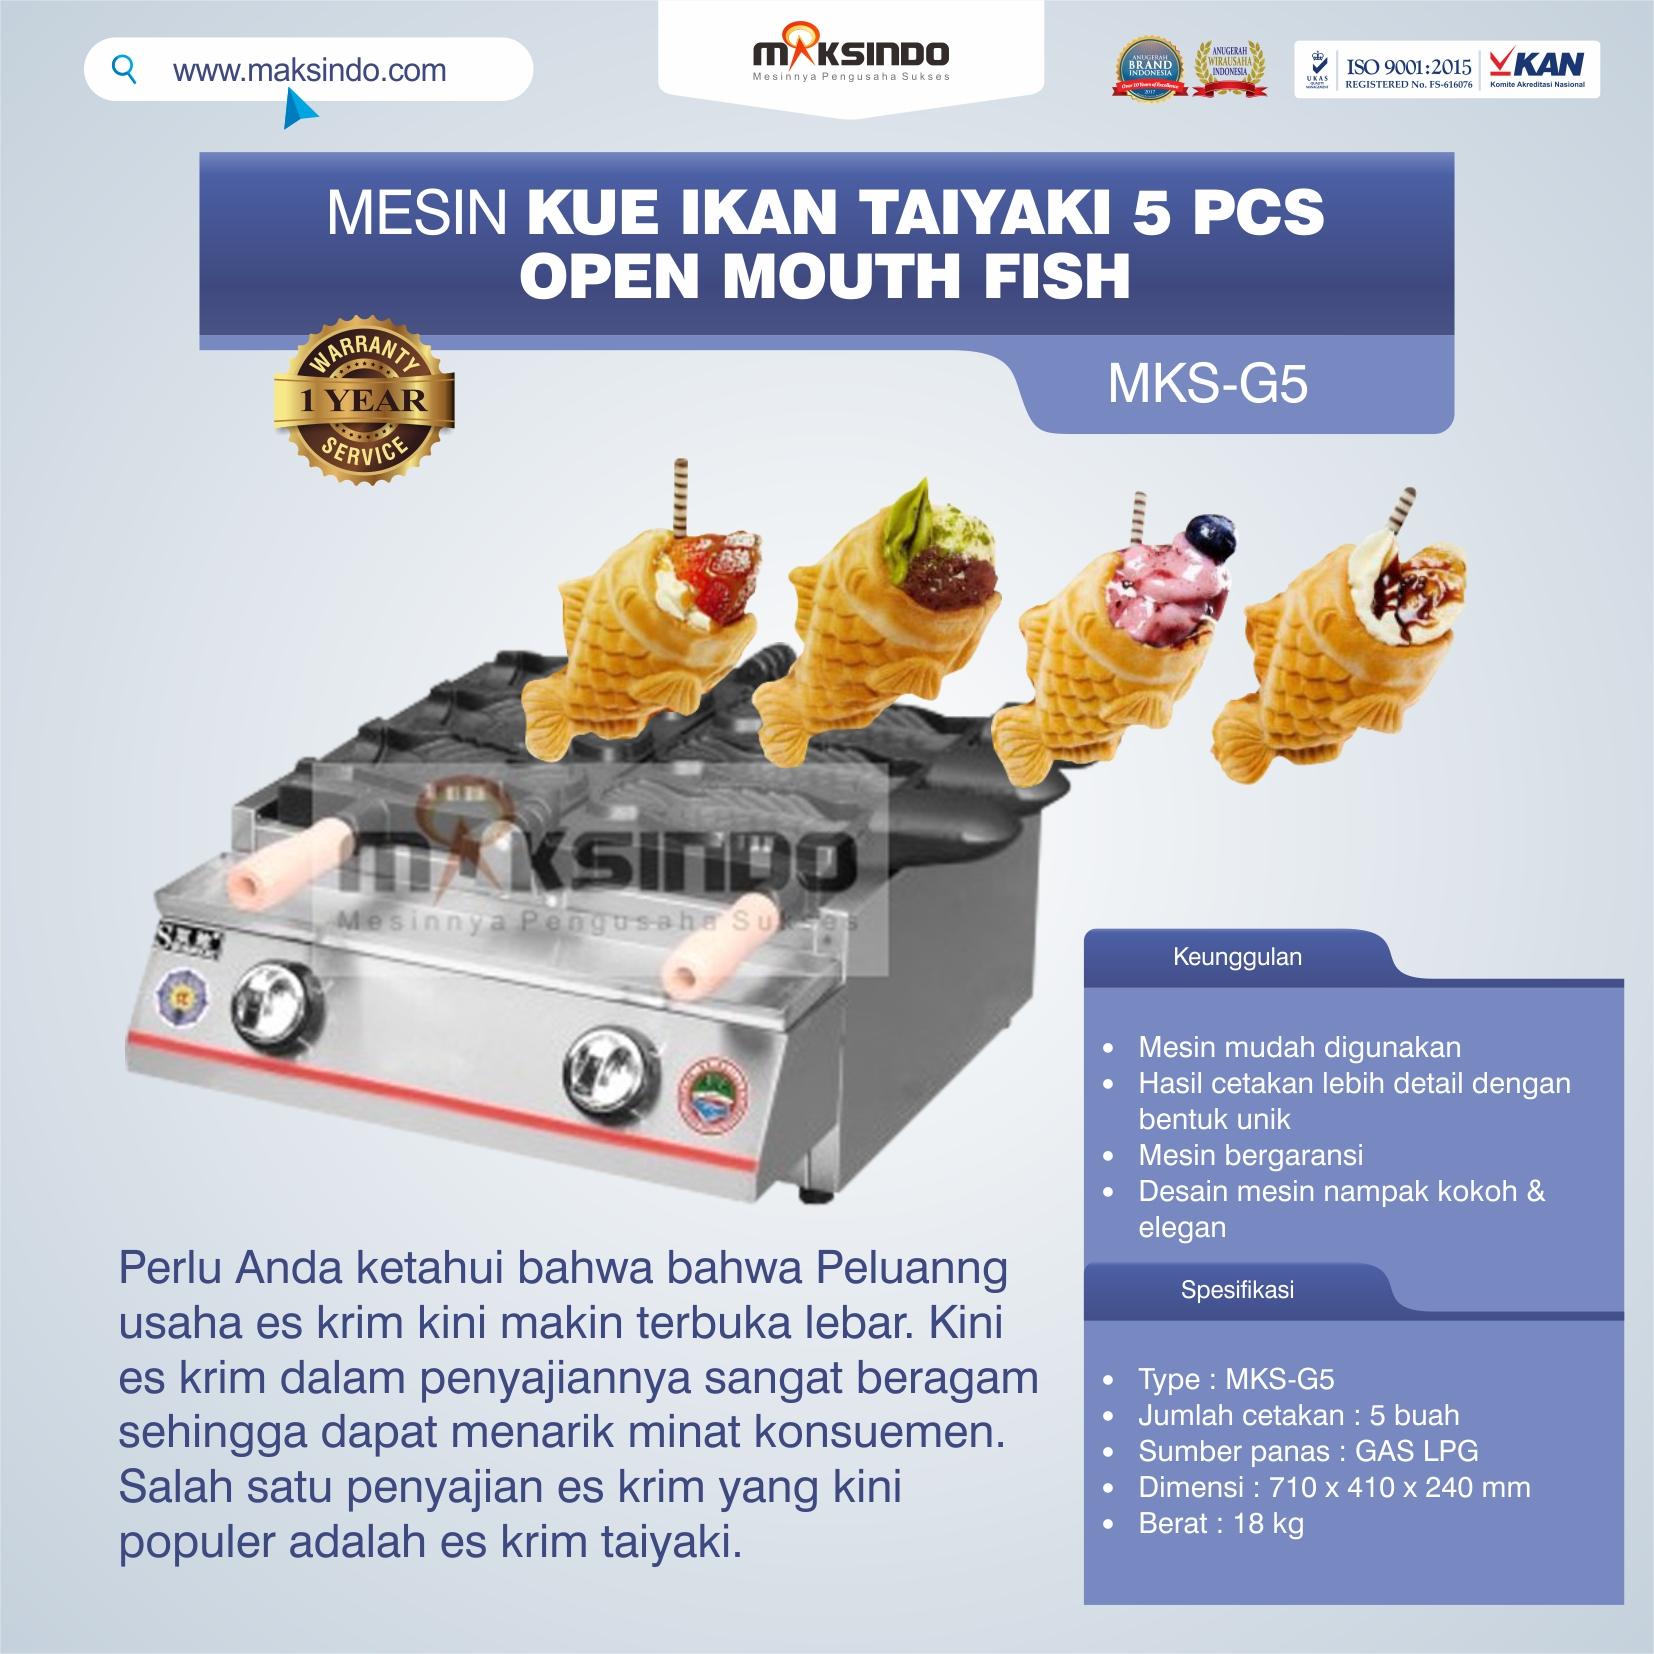 Jual Mesin Kue Ikan Taiyaki 5 Pcs – Open Mouth Fish di Makassar